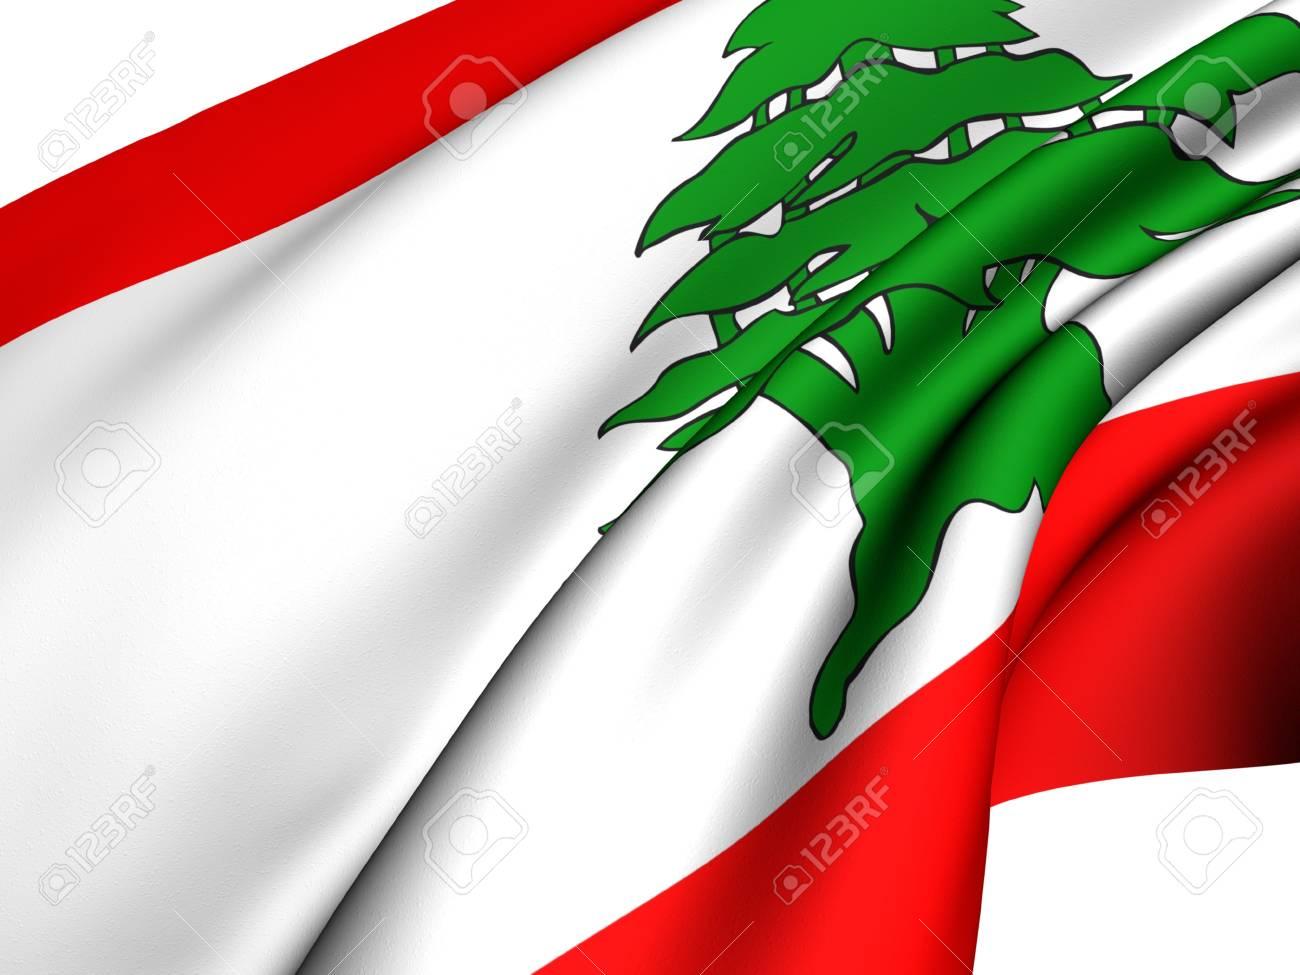 Flag of Lebanon against white background. Close up. Stock Photo - 8557651